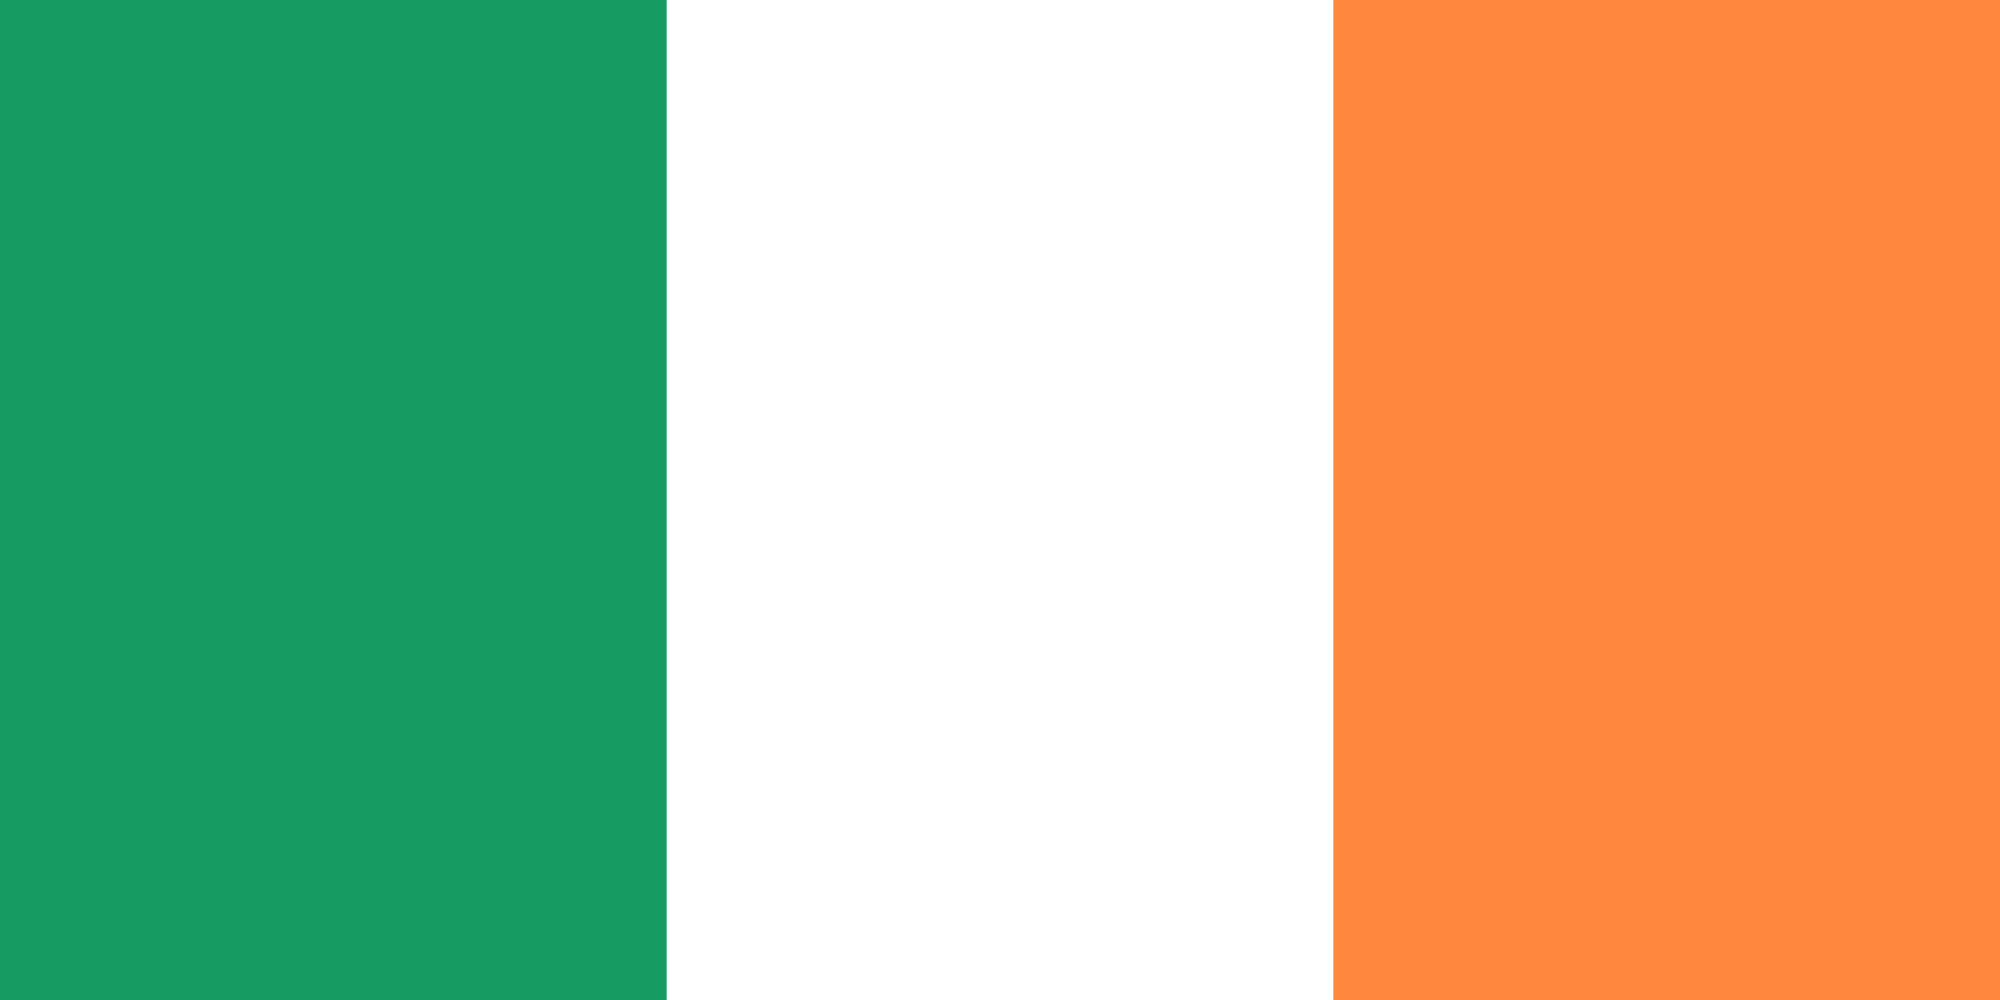 Image of the Irish flag